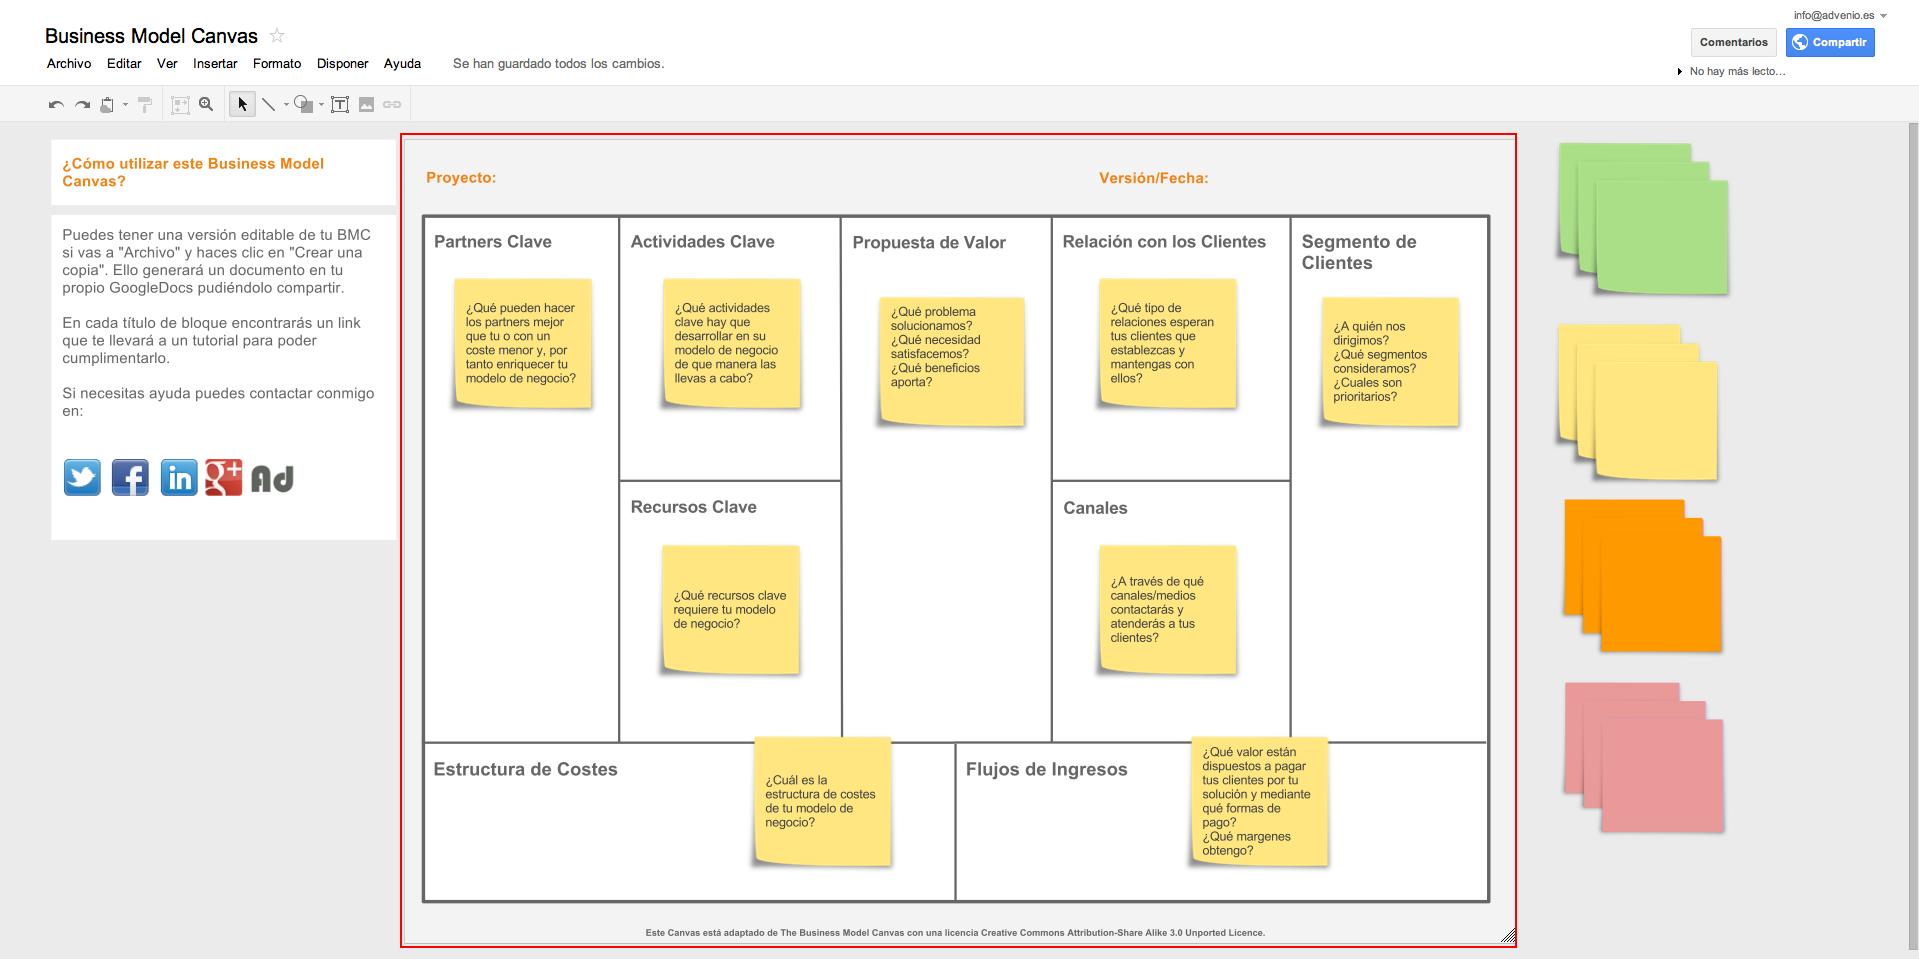 Business Model Canvas - Advenio